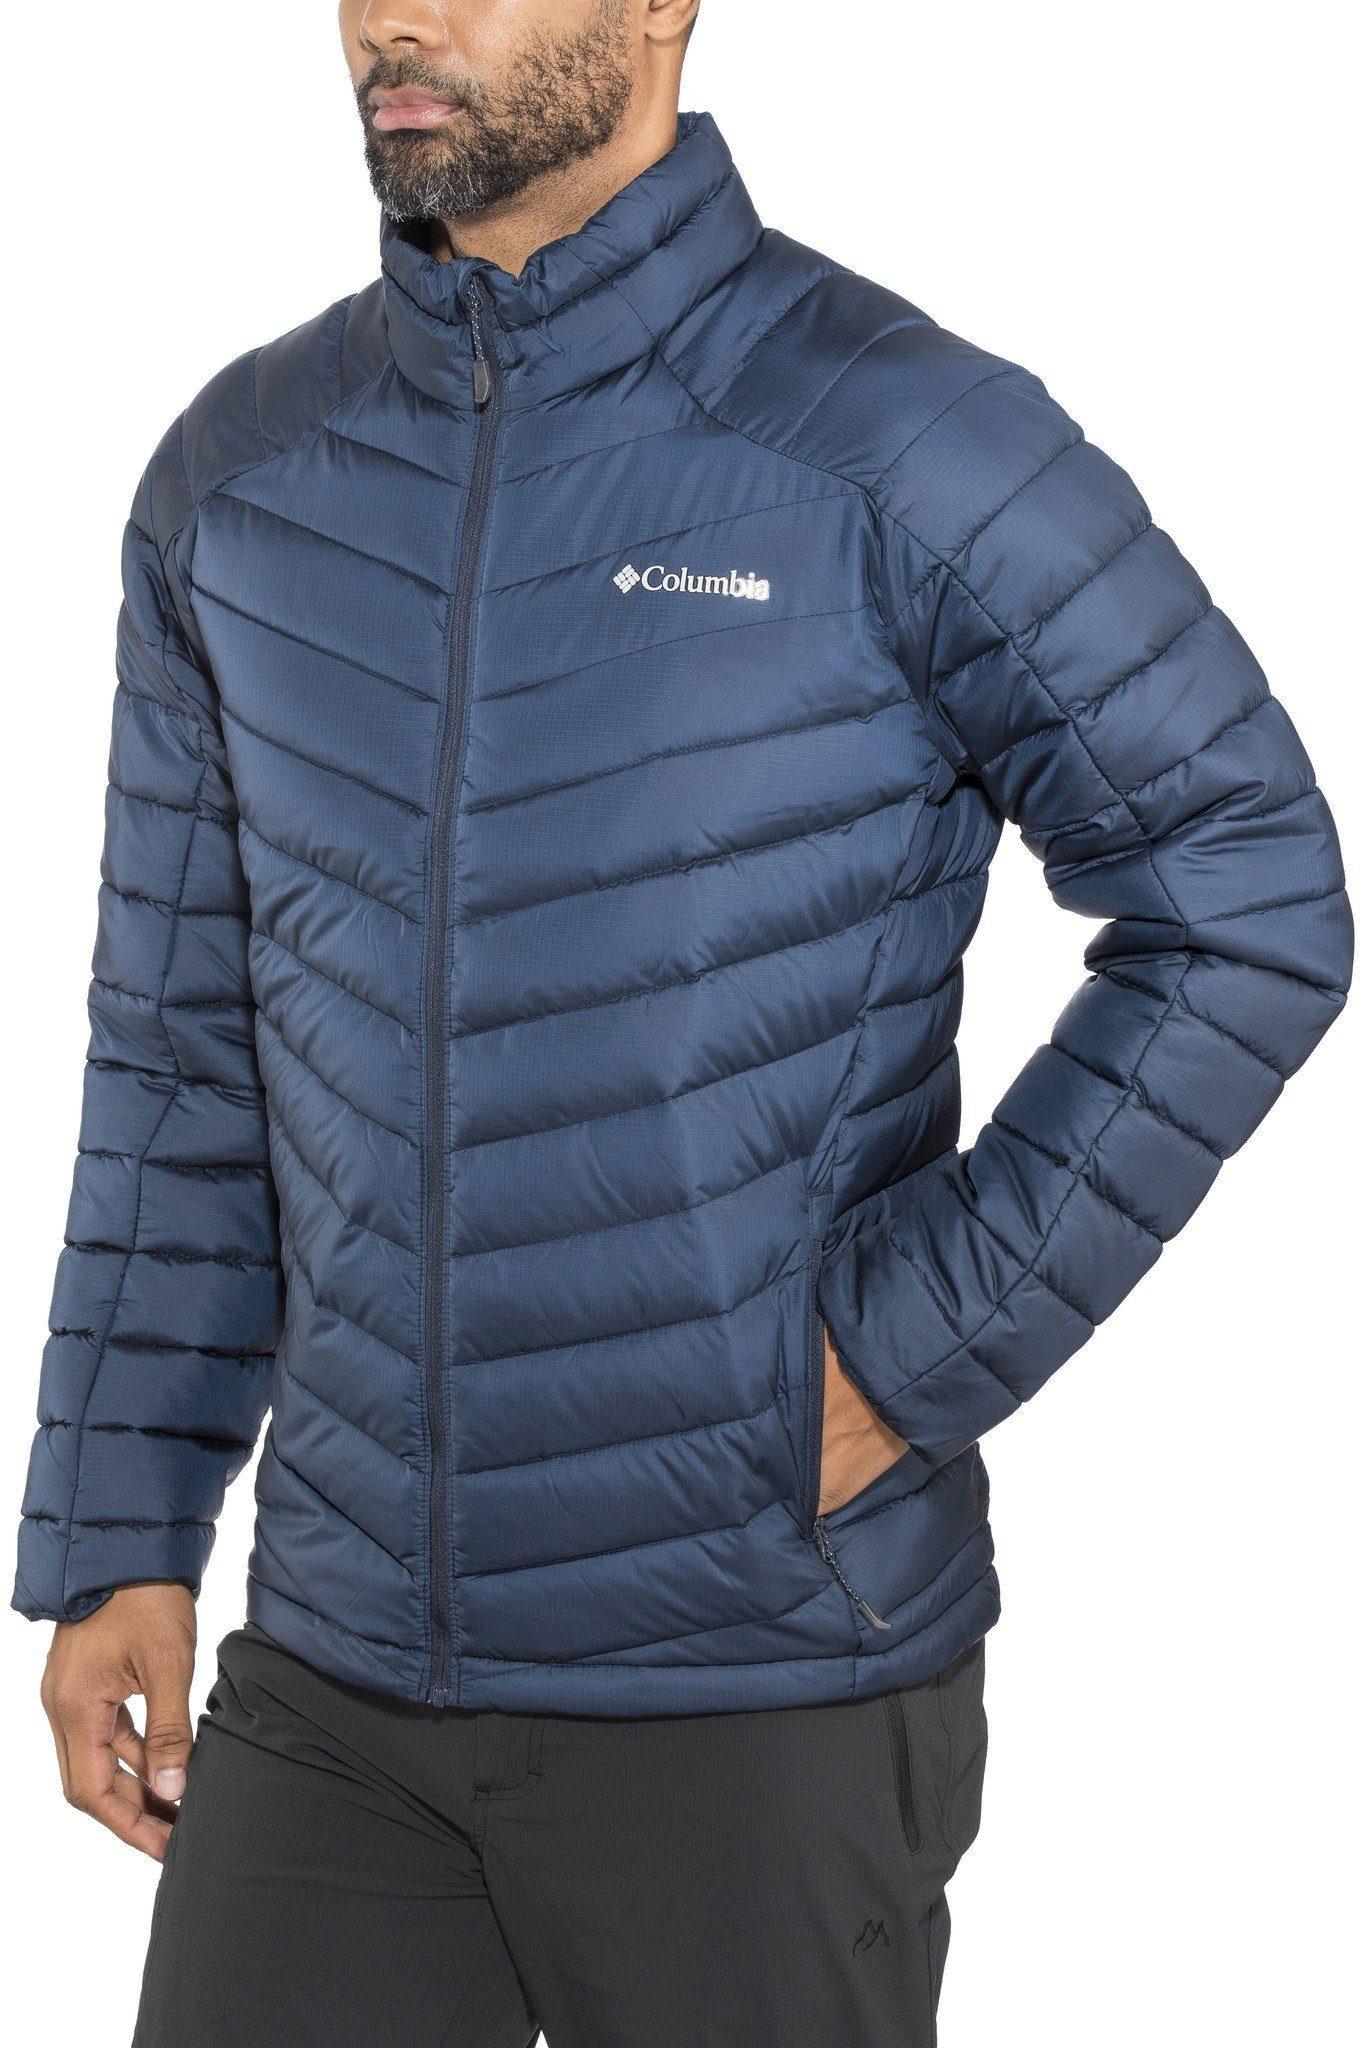 Columbia Outdoorjacke »Horizon Exp***** Jacket Herren« online kaufen   OTTO